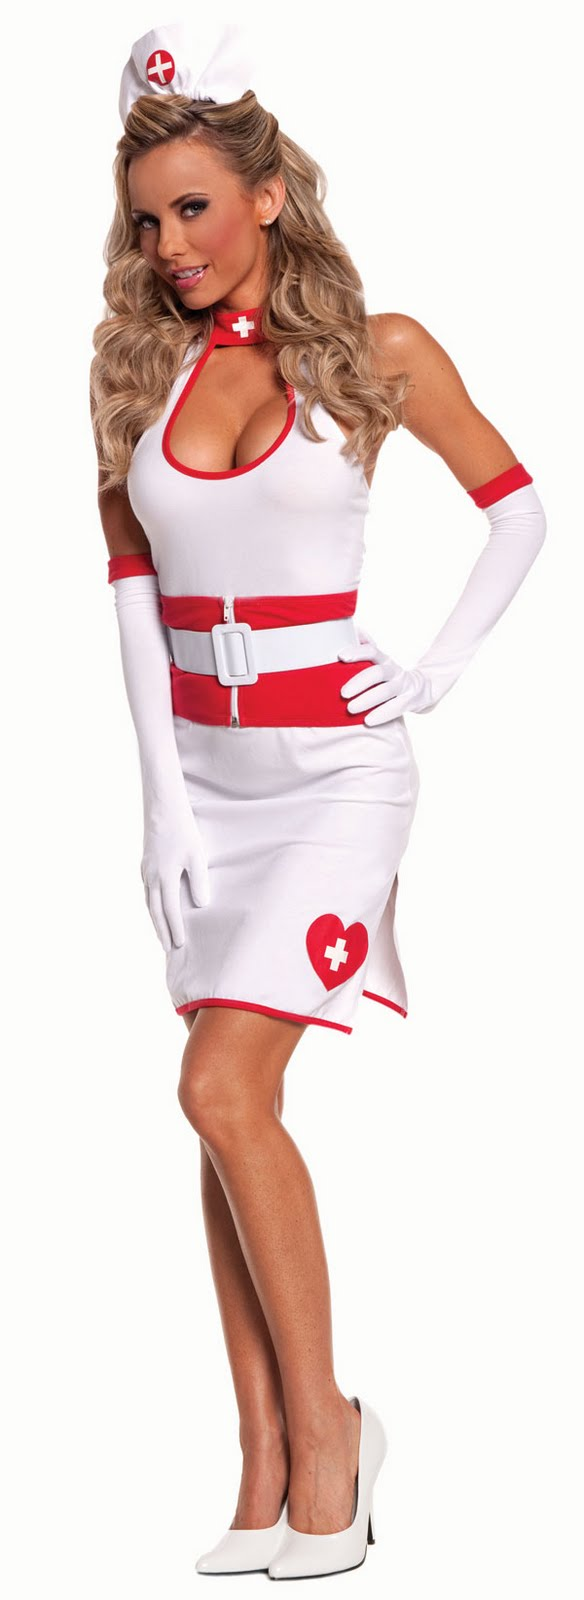 hot mallu sexy women girls in sexy nurses uniform  very sexy and hot